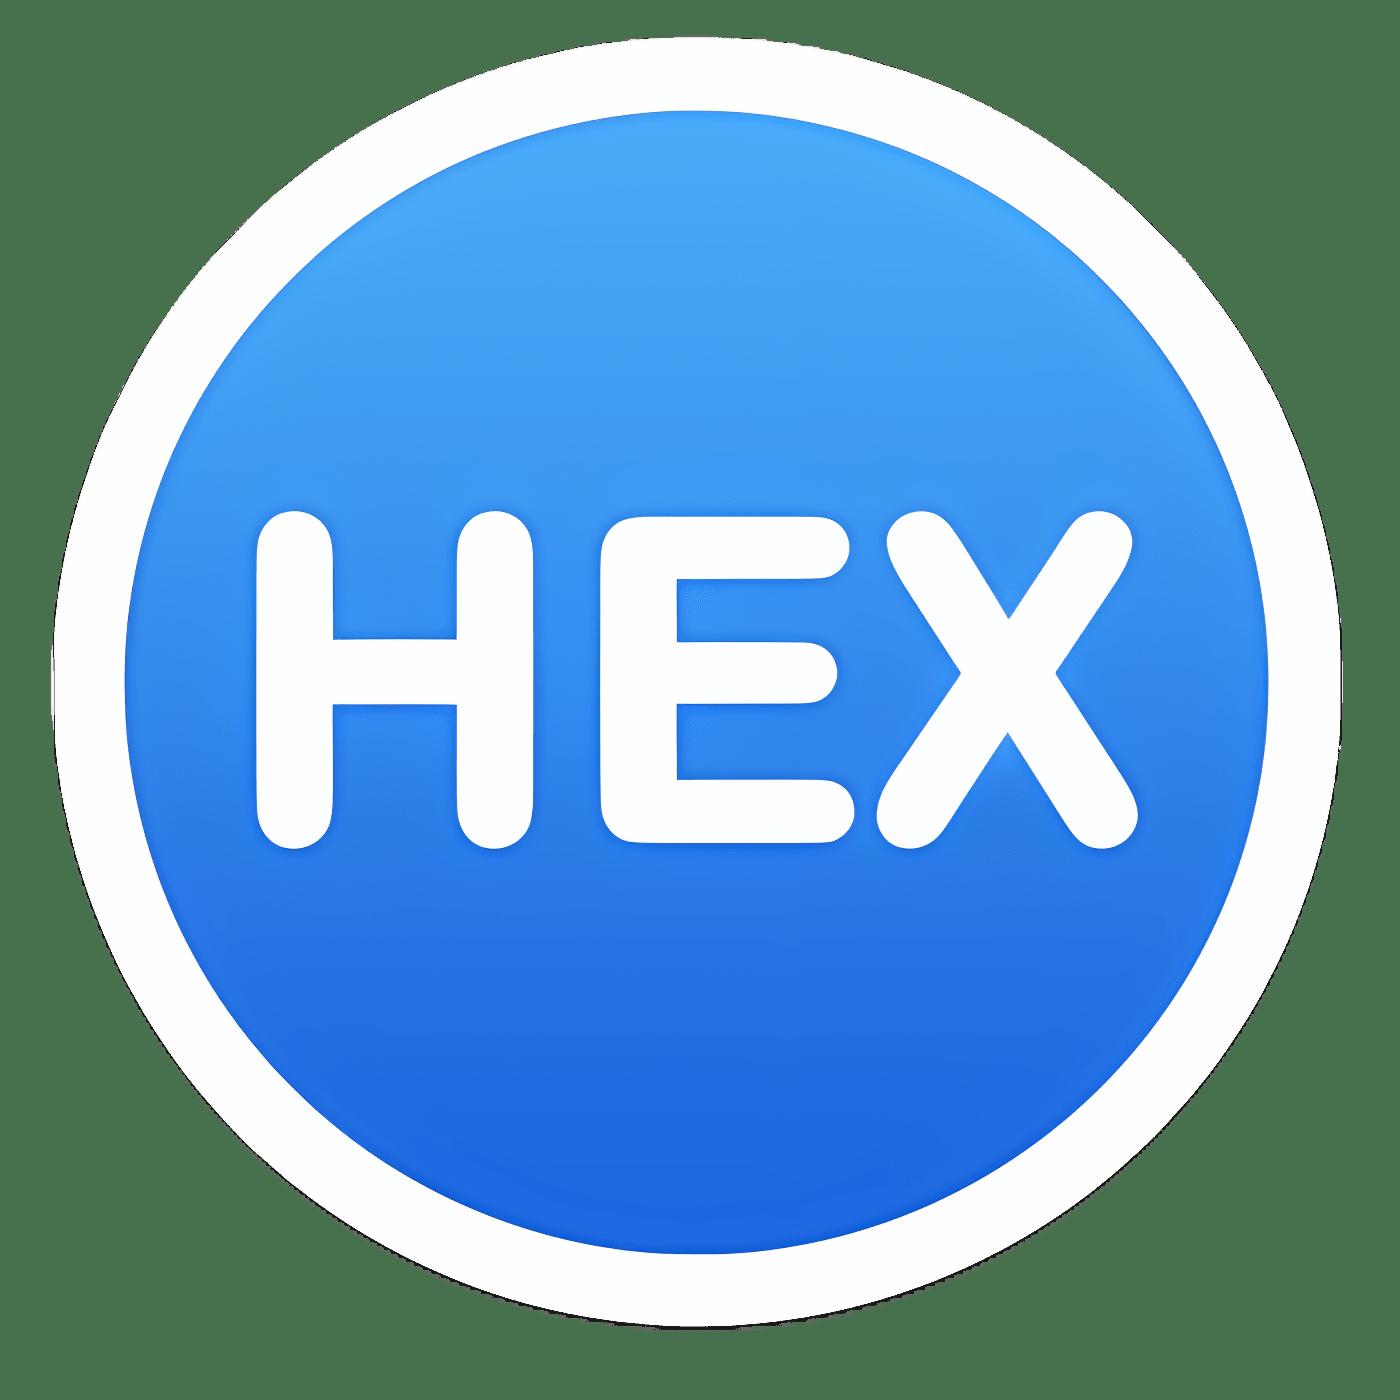 iHex - Hex Editor